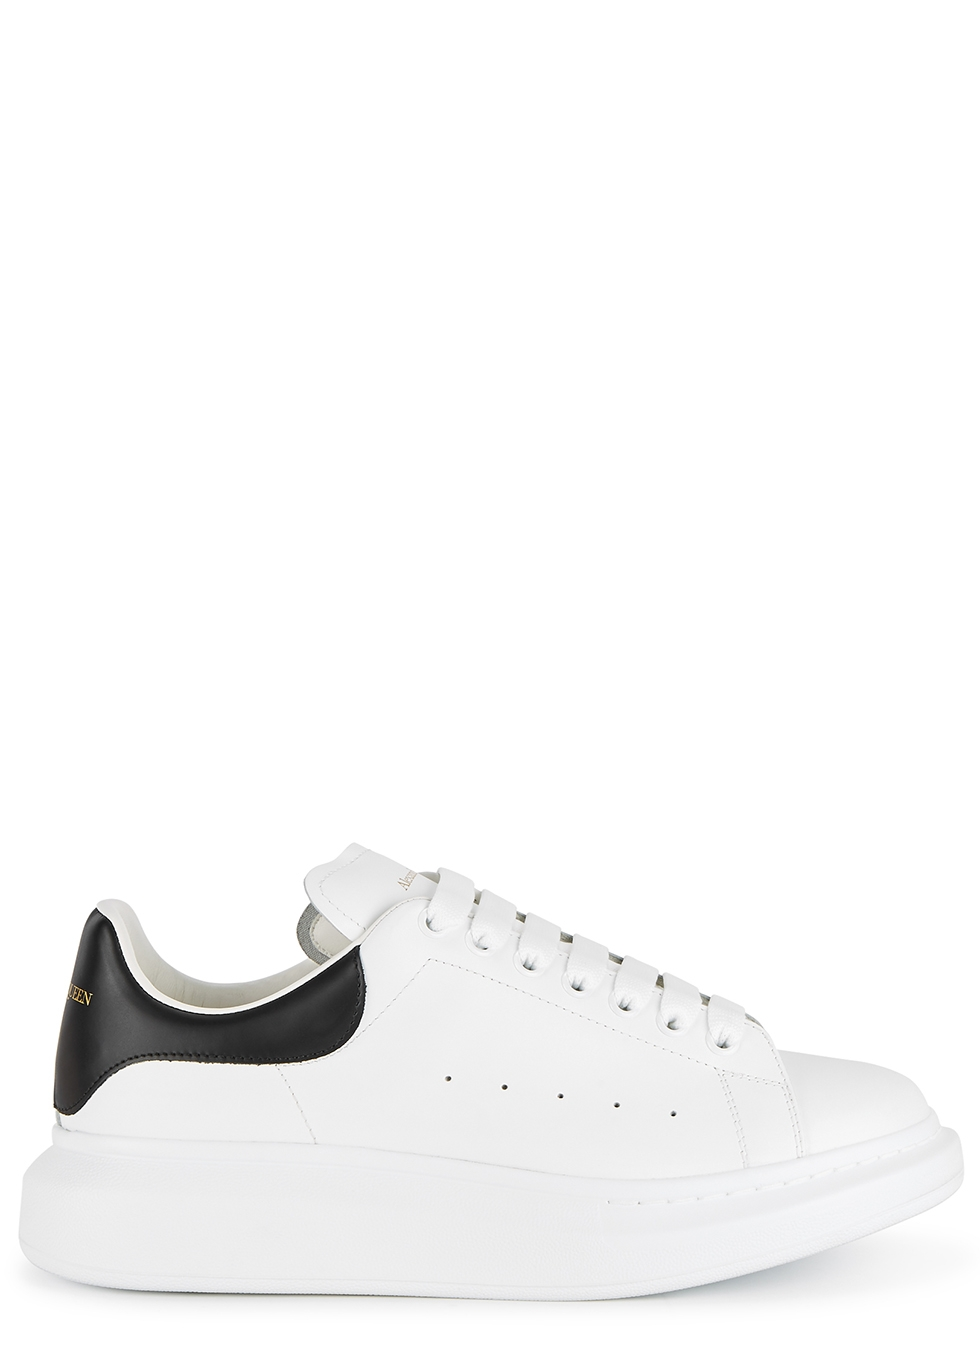 Men's Harvey Nichols TrainersSneakersamp; Shoes Designer Sports rdxQBWCoe